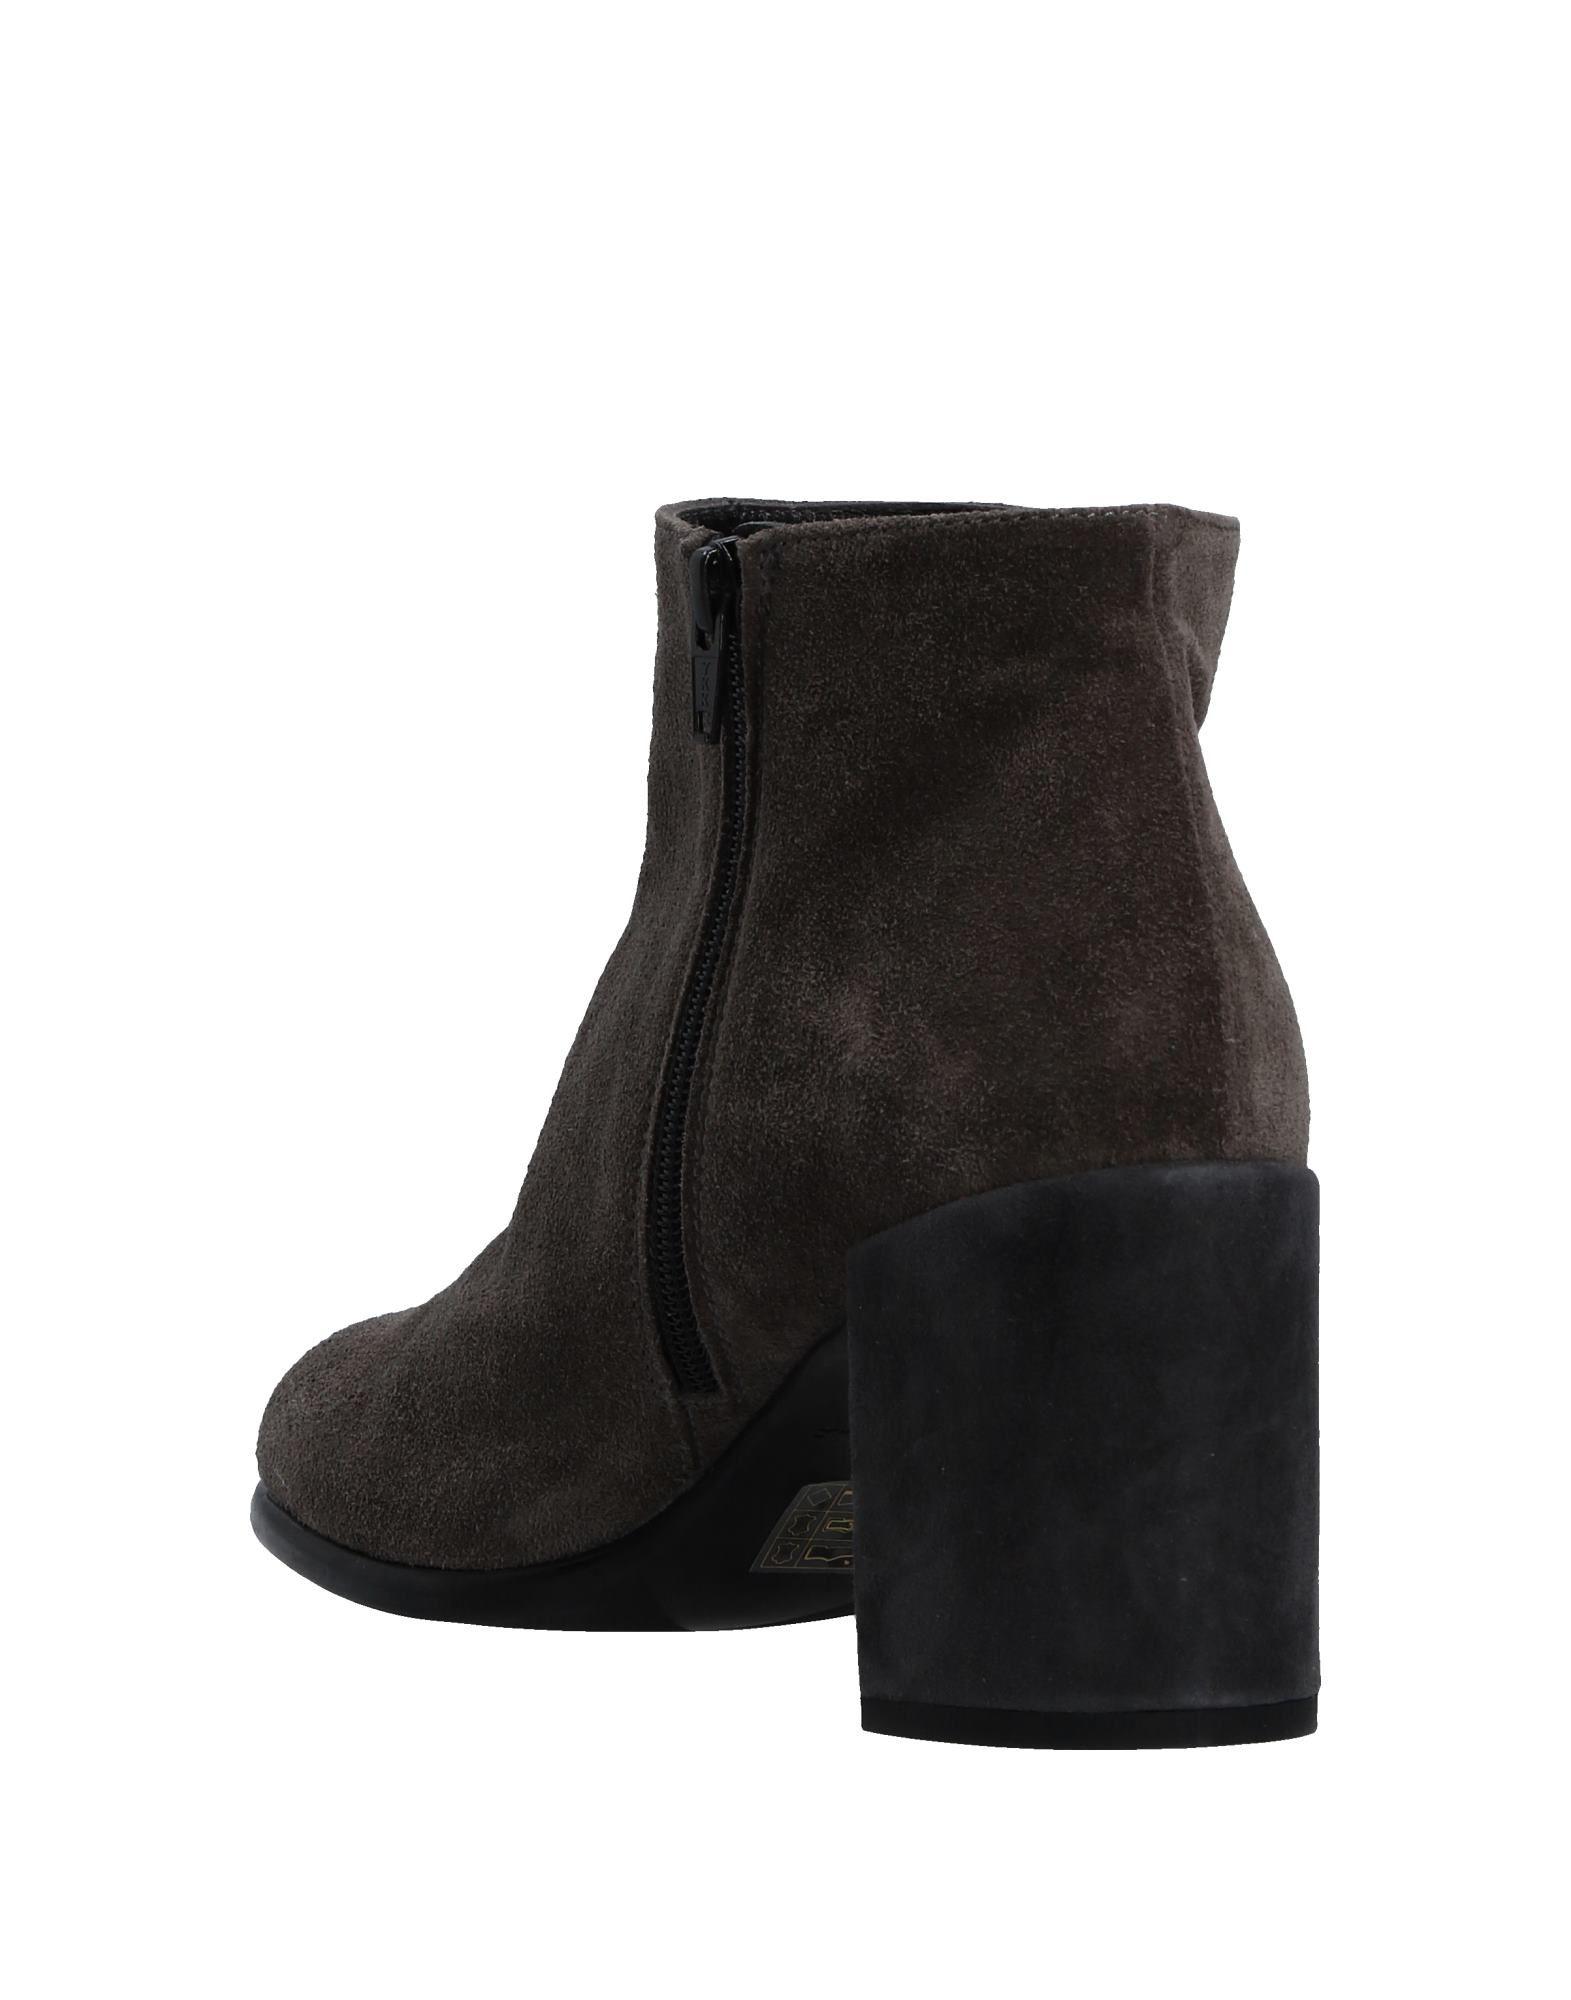 Gut um billige Schuhe Damen zu tragenTriver Flight Stiefelette Damen Schuhe  11525464PW e02aa9